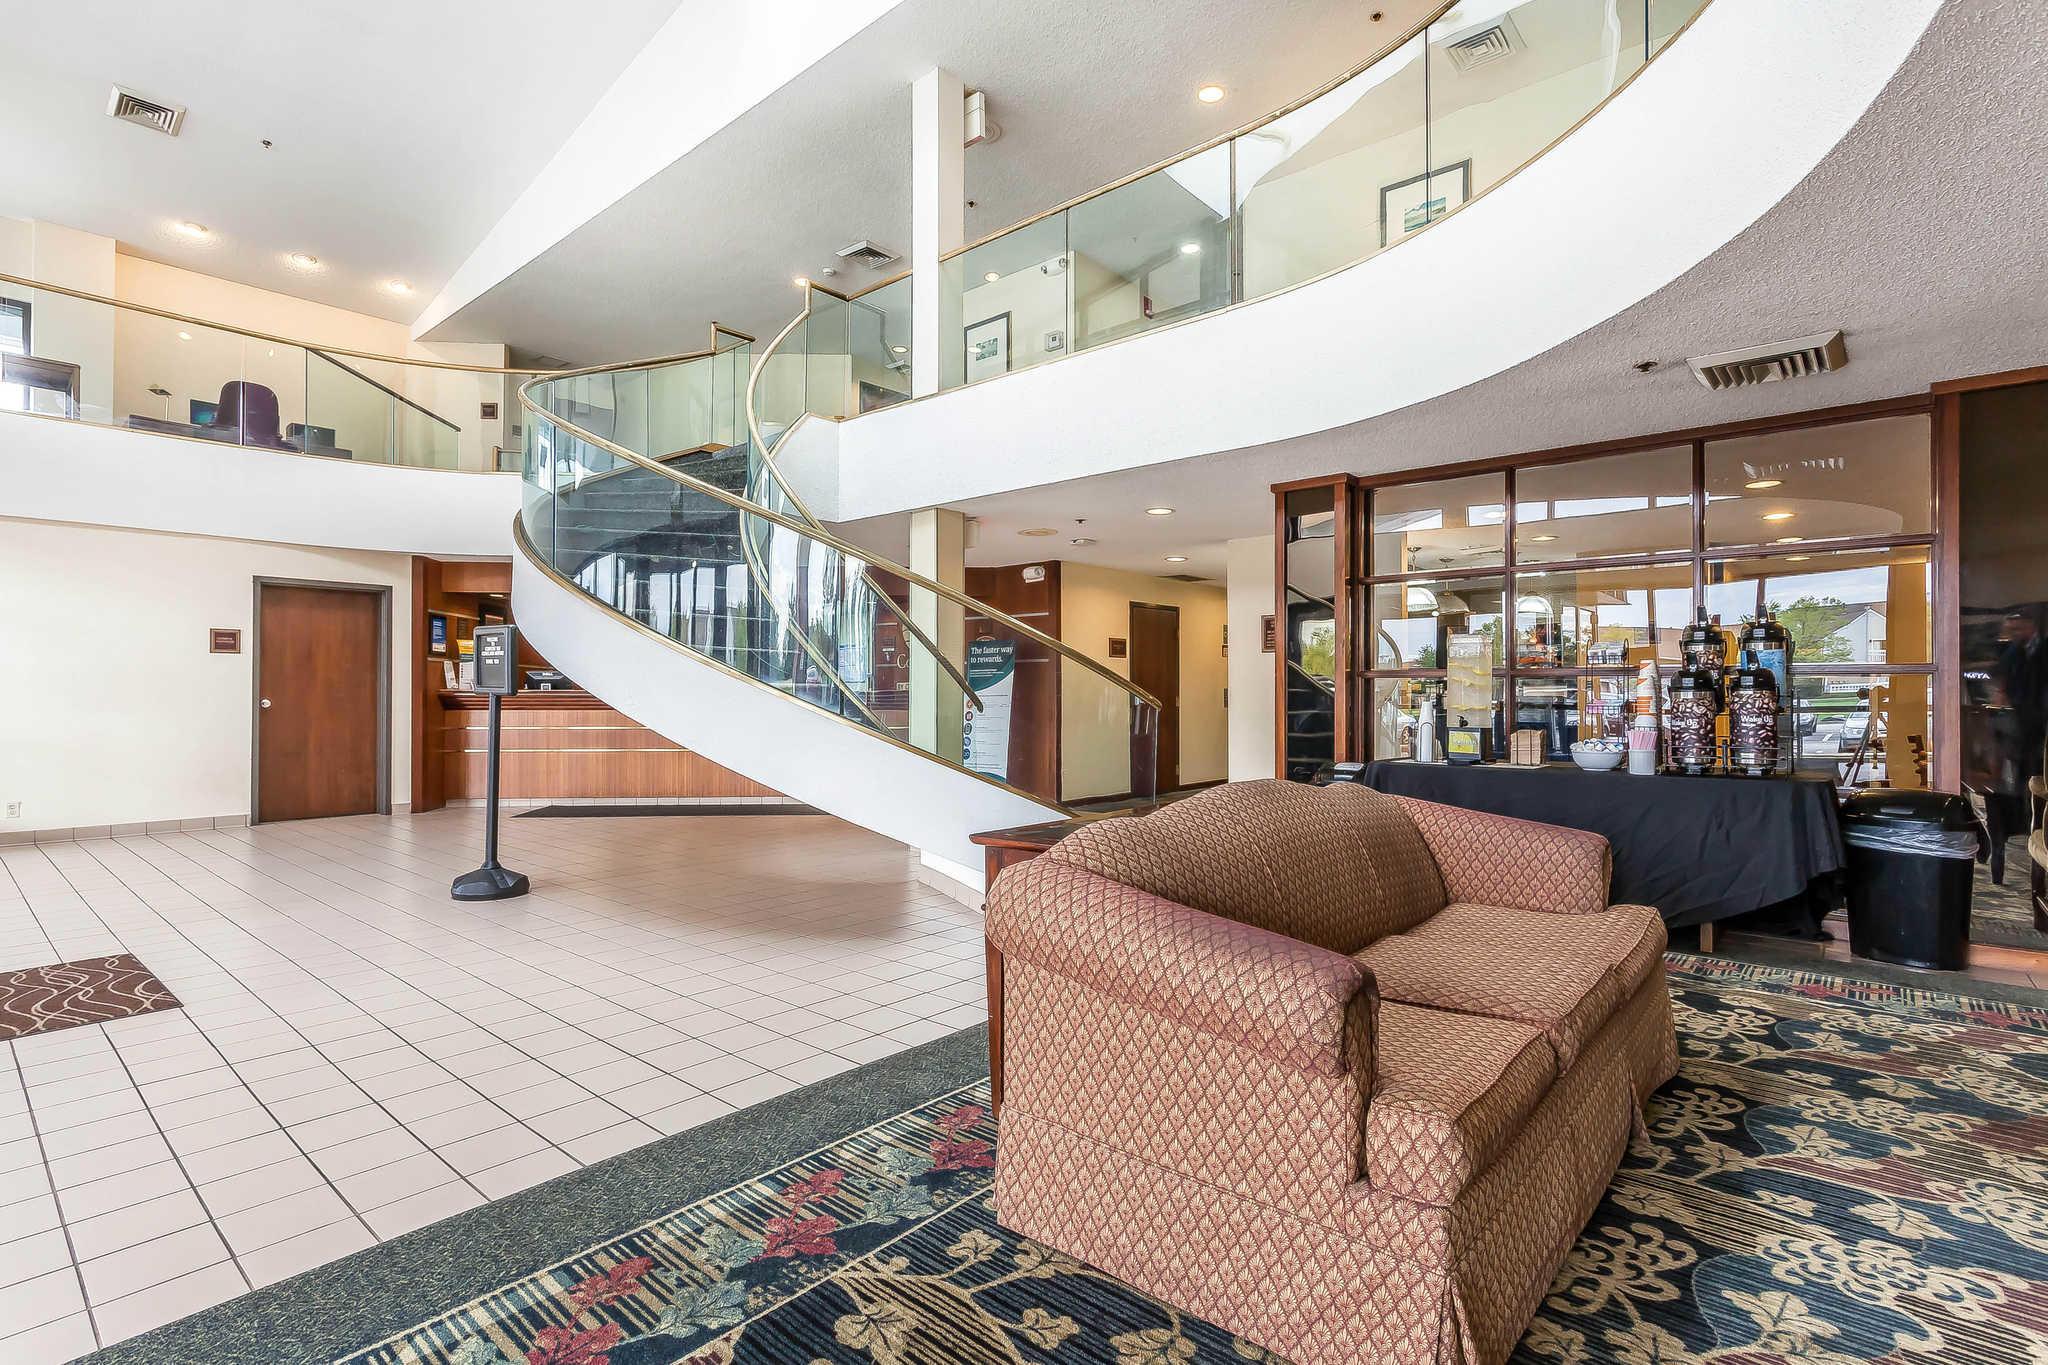 Comfort Inn Cleveland Airport image 5